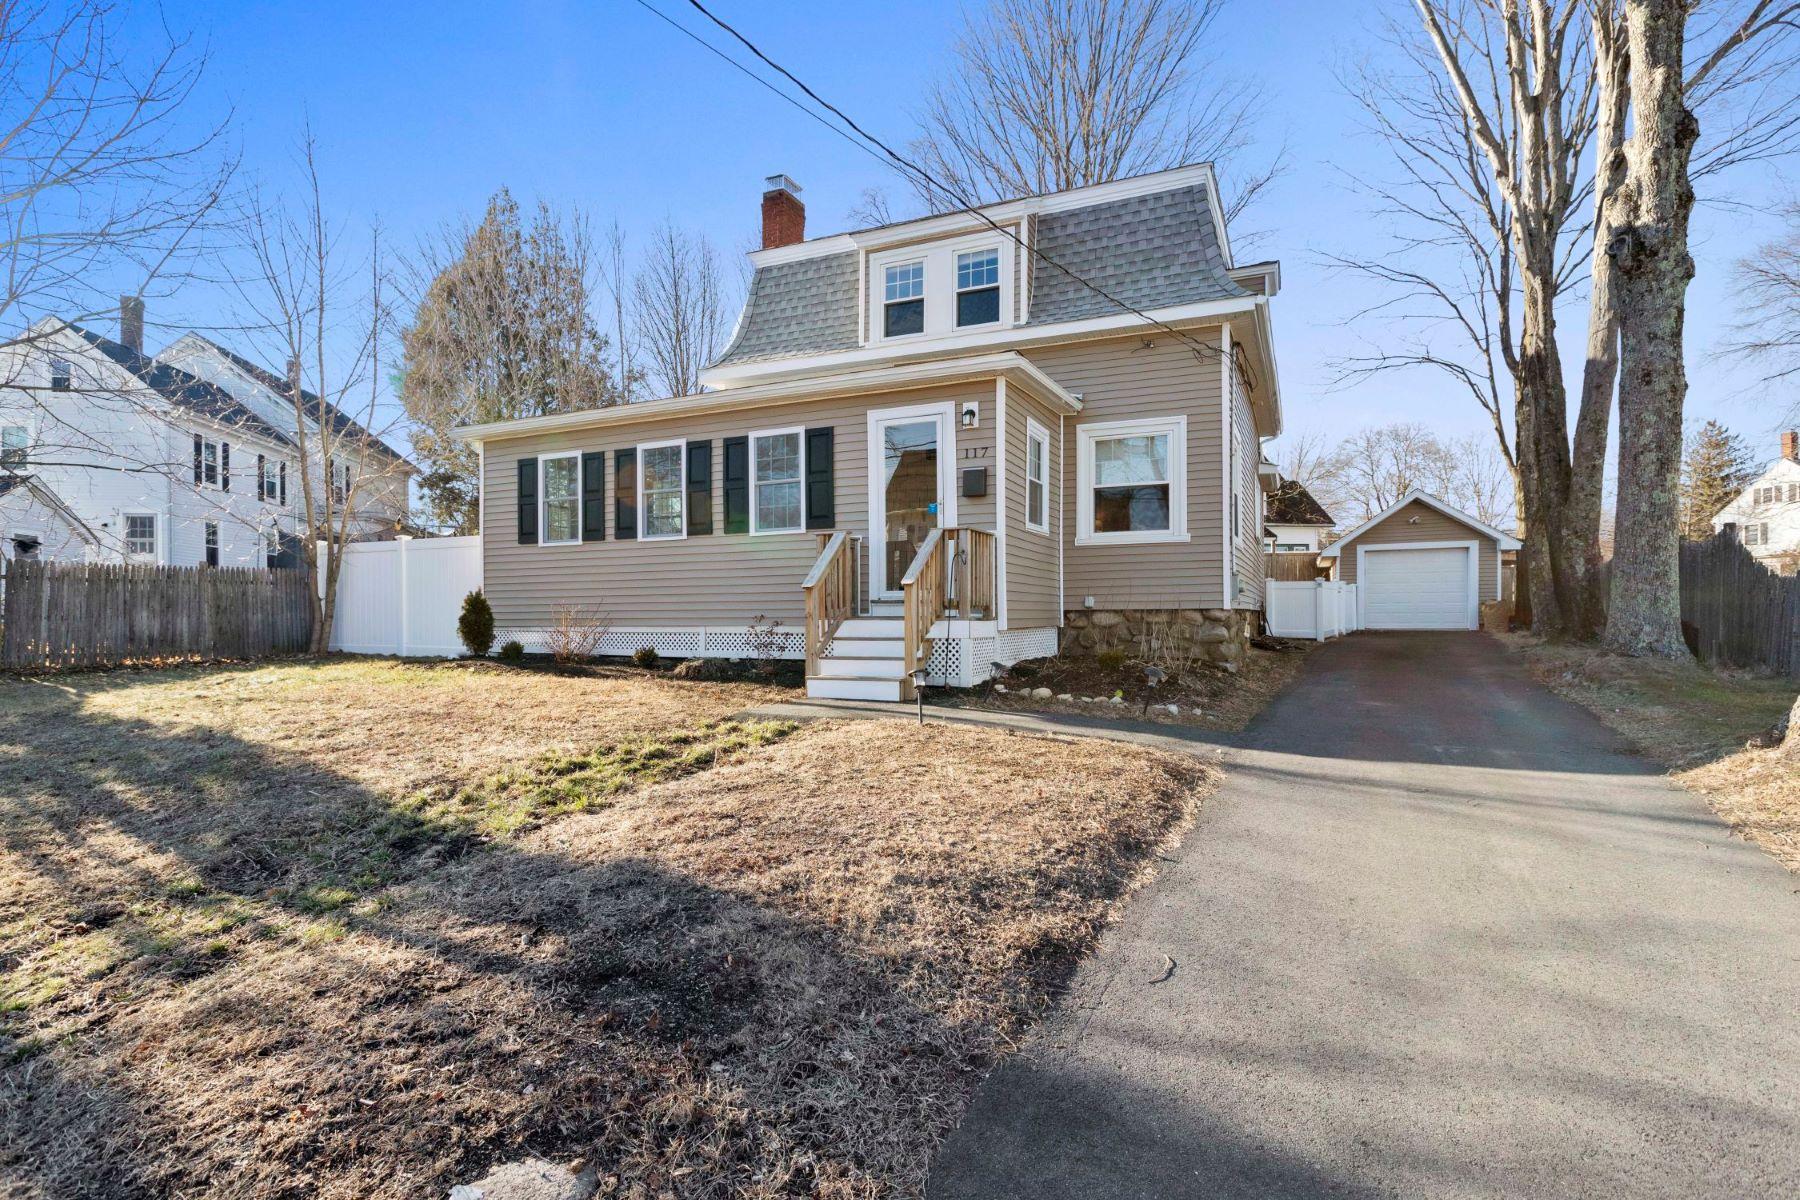 Single Family Homes για την Πώληση στο Millis, Μασαχουσετη 02054 Ηνωμένες Πολιτείες